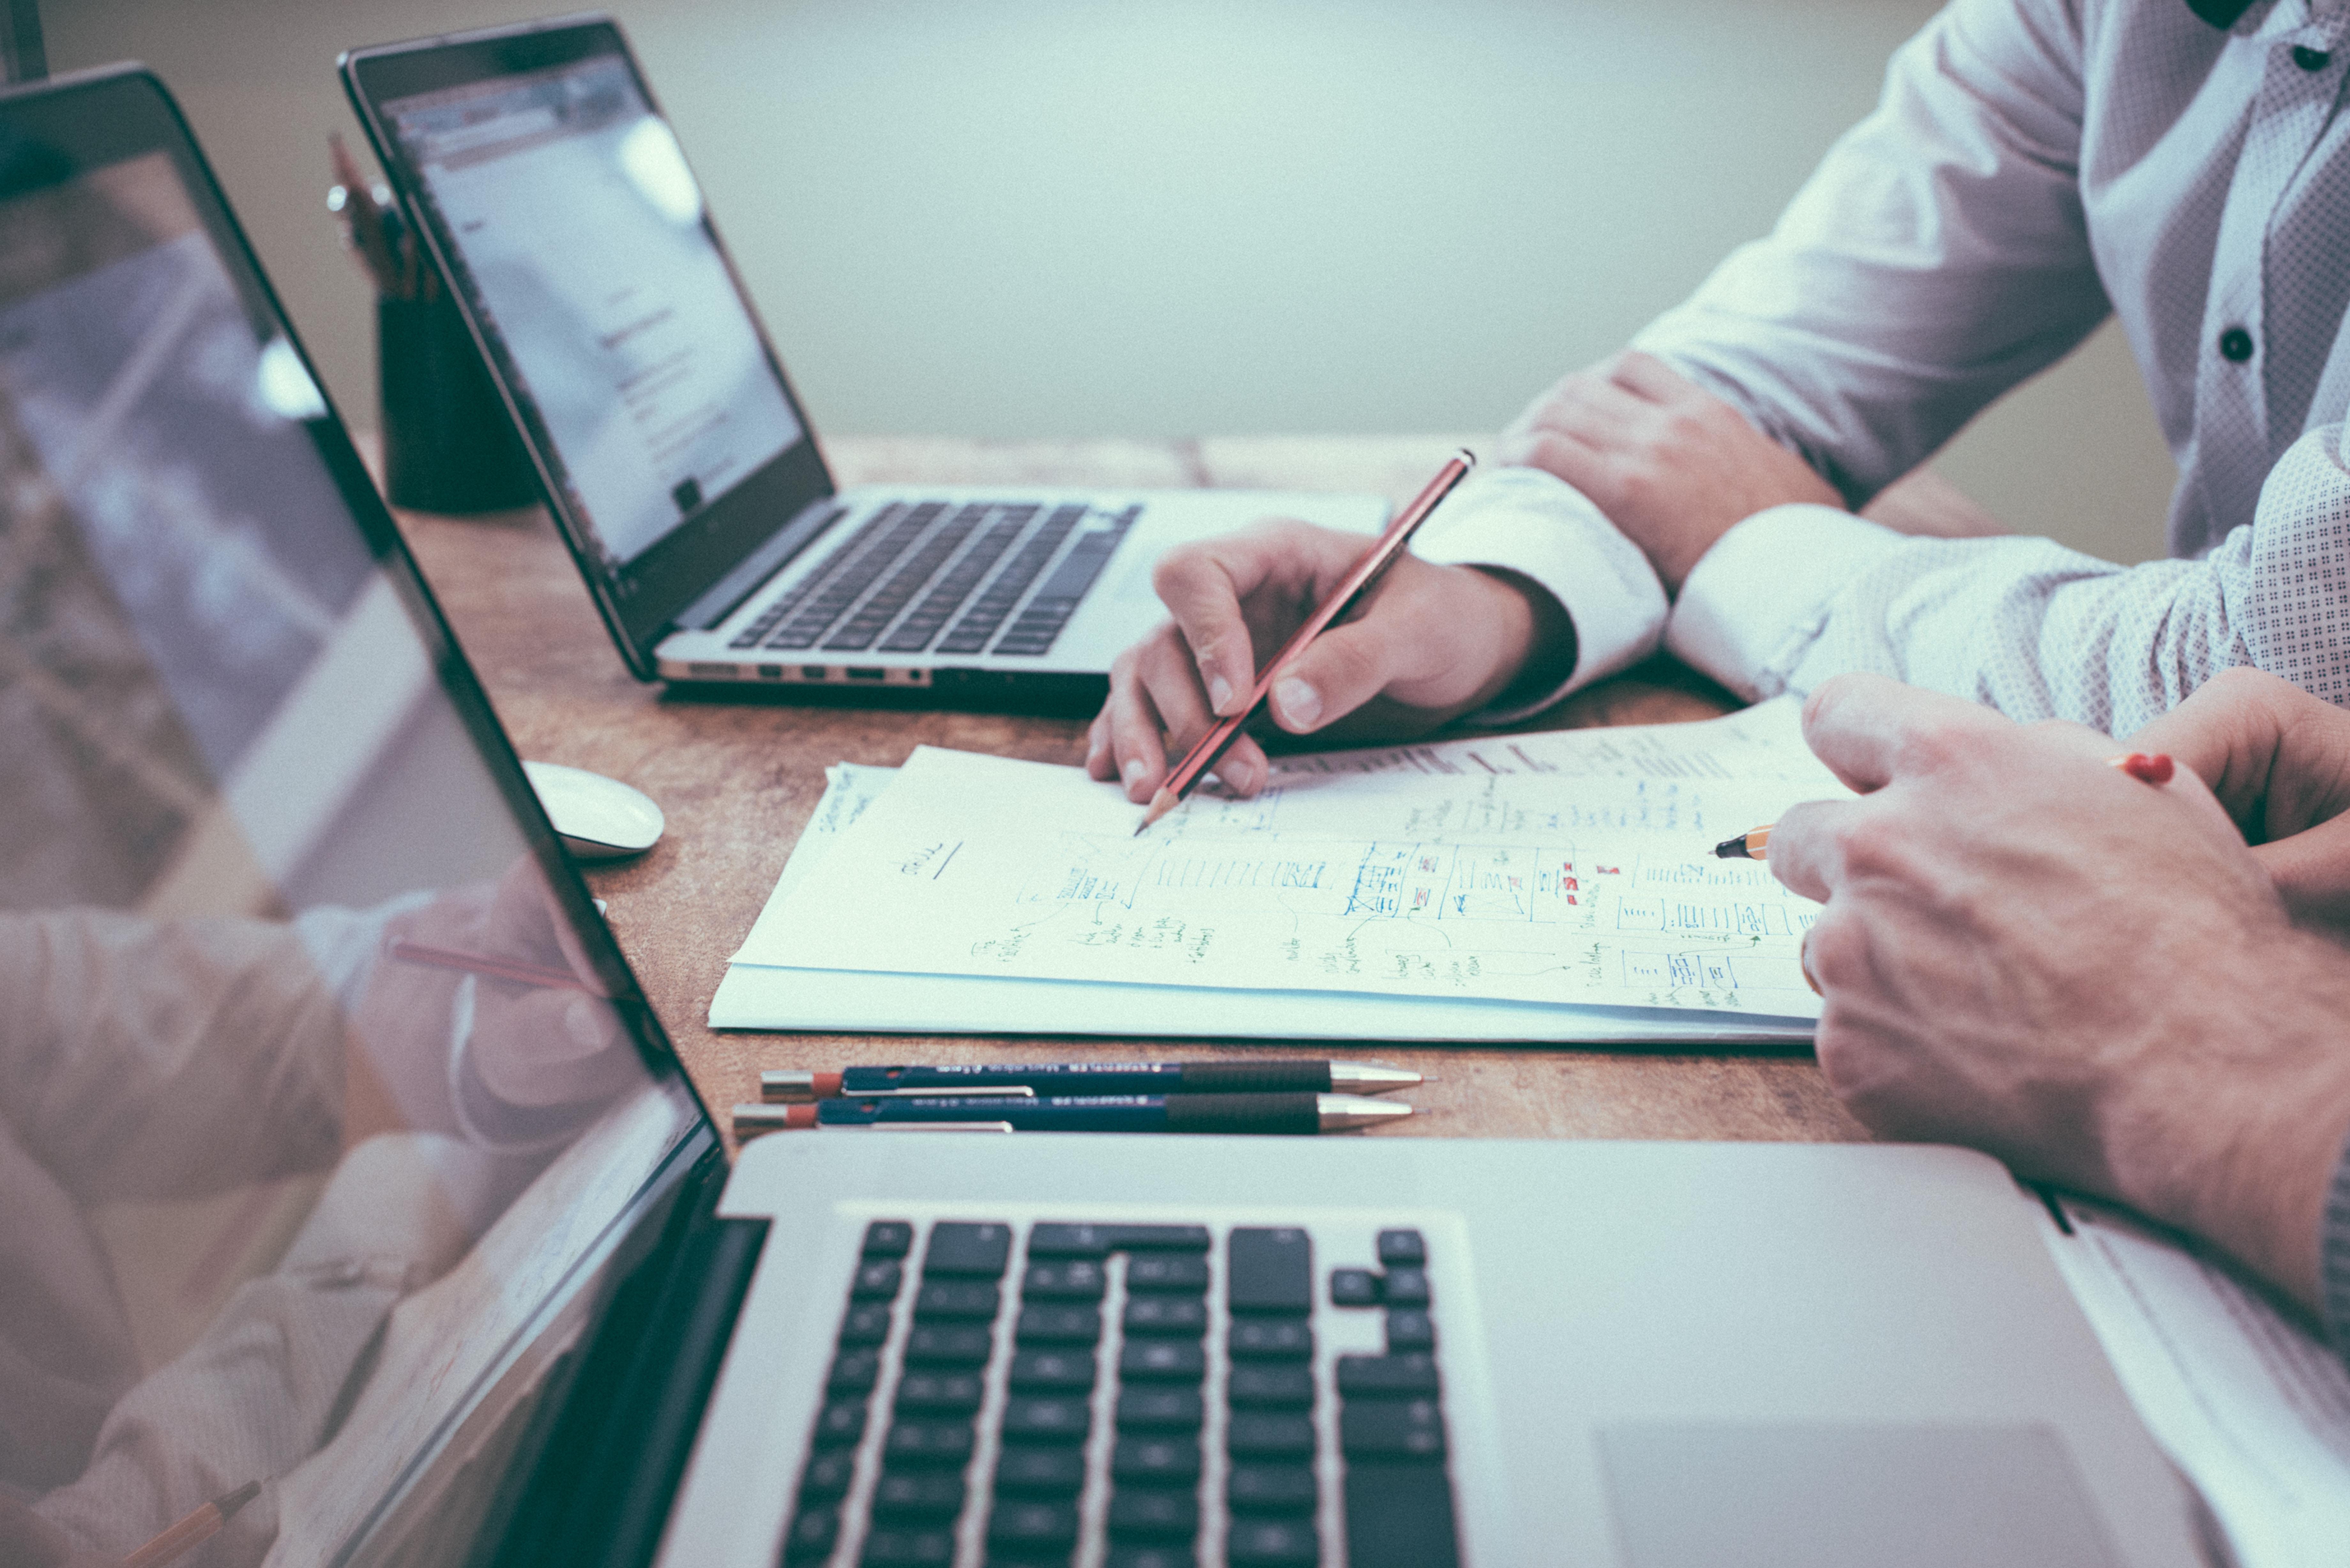 Maintenance ROI and KPI